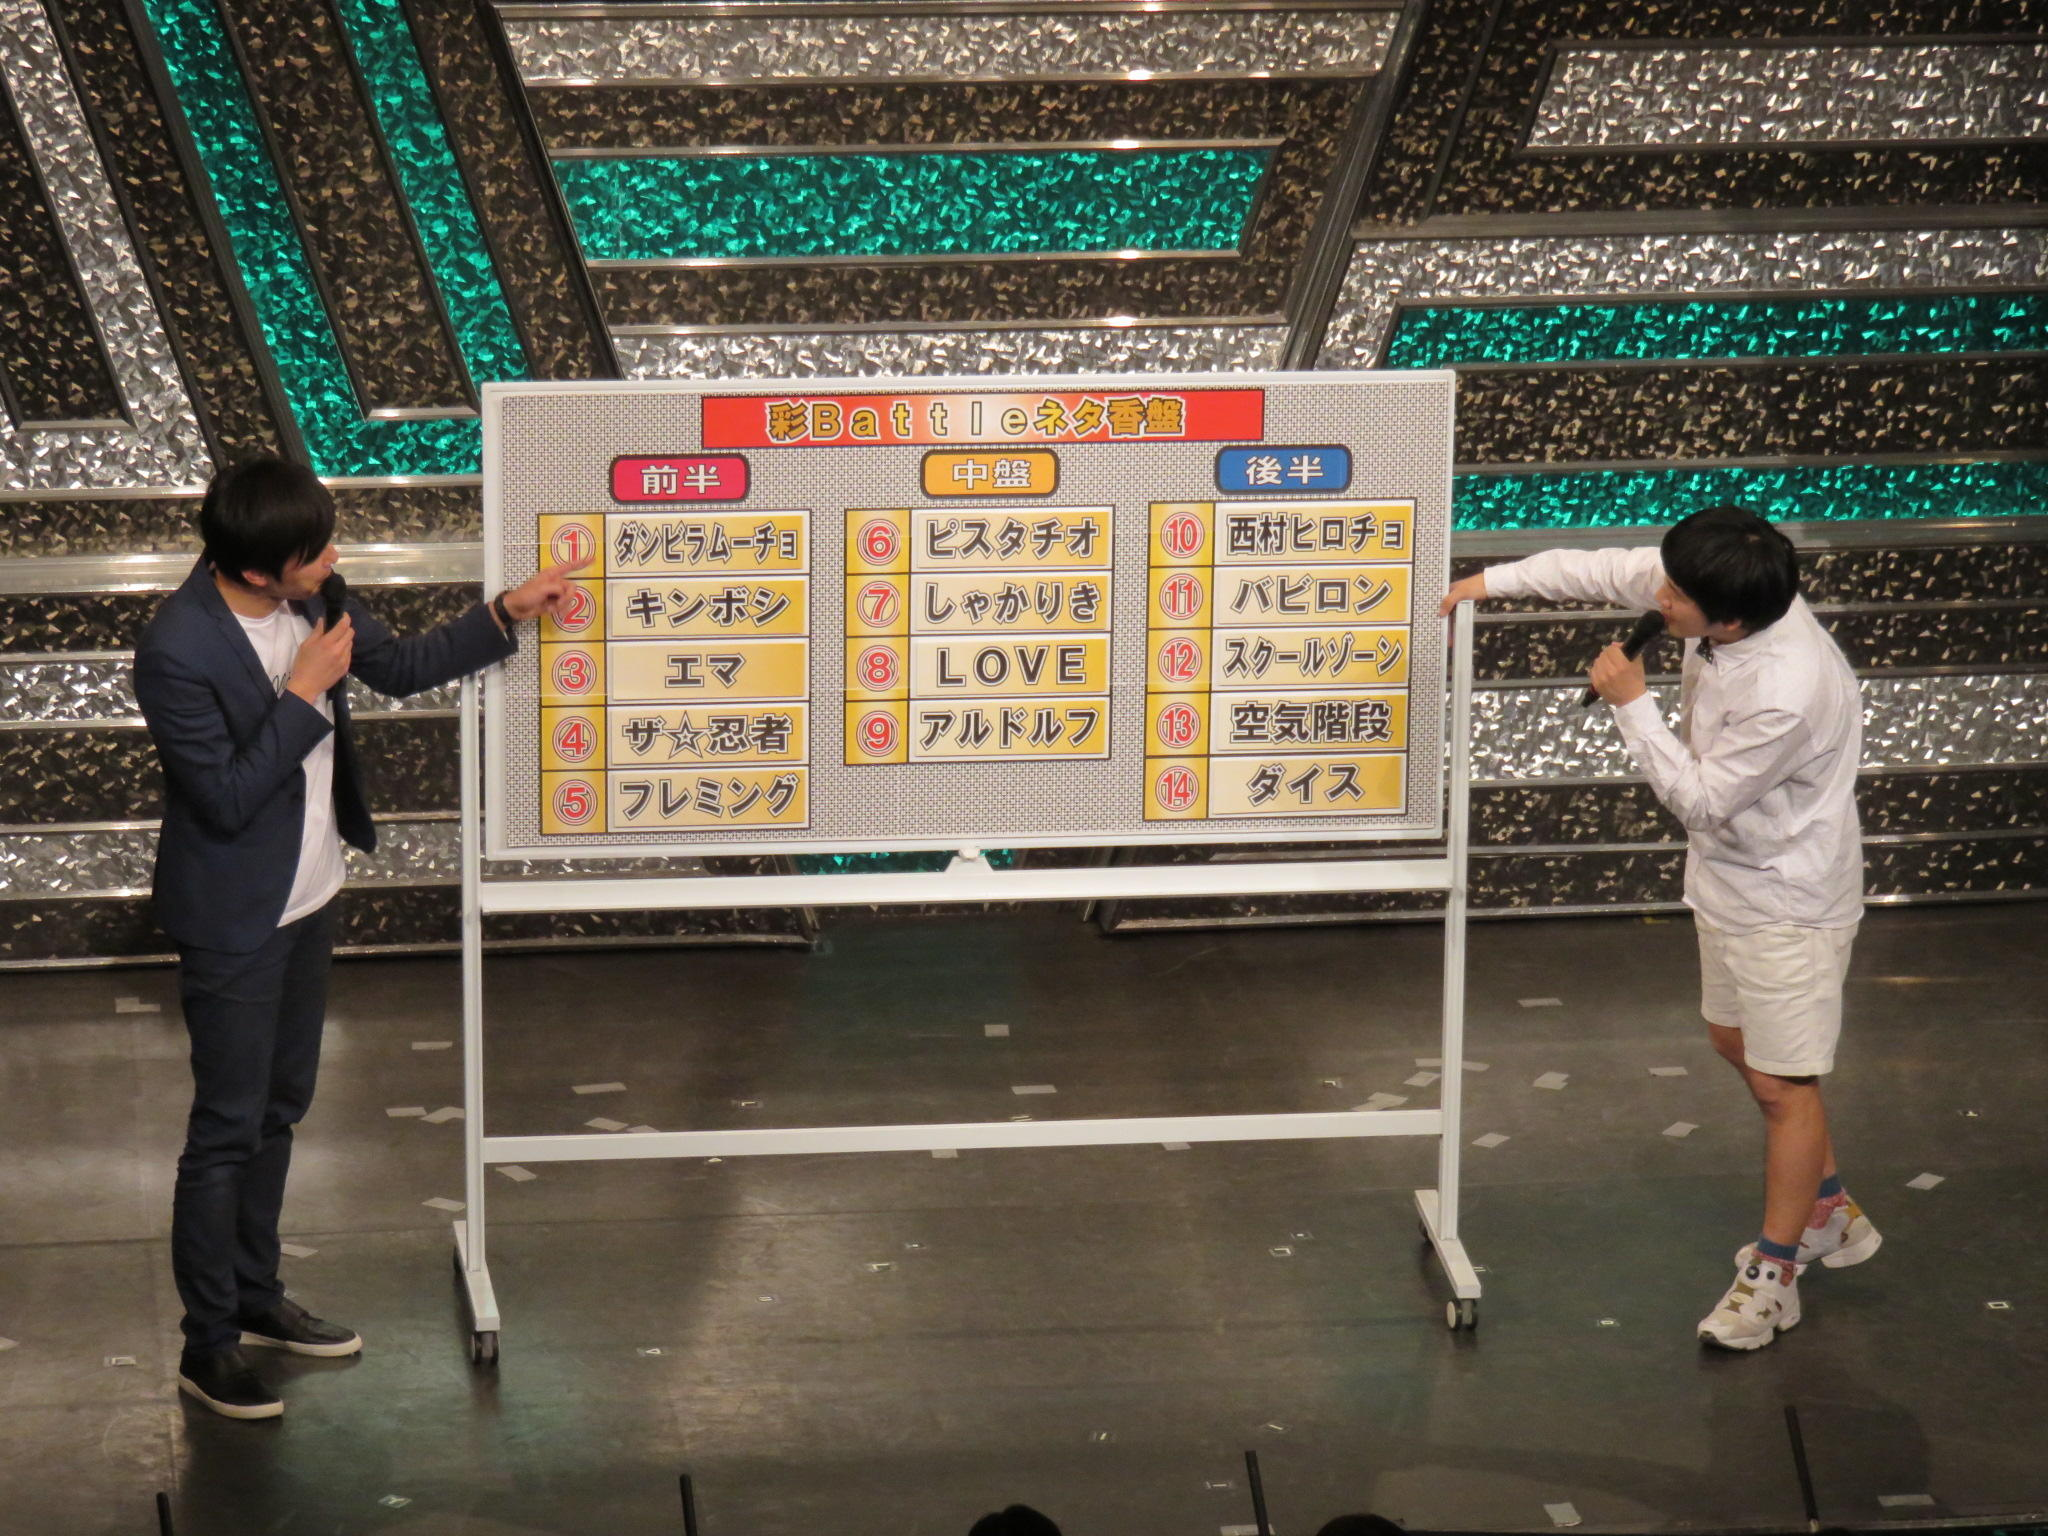 http://news.yoshimoto.co.jp/20160229143927-5bd76b7dc36ee3b5166f679beb85f57e0408edde.jpg